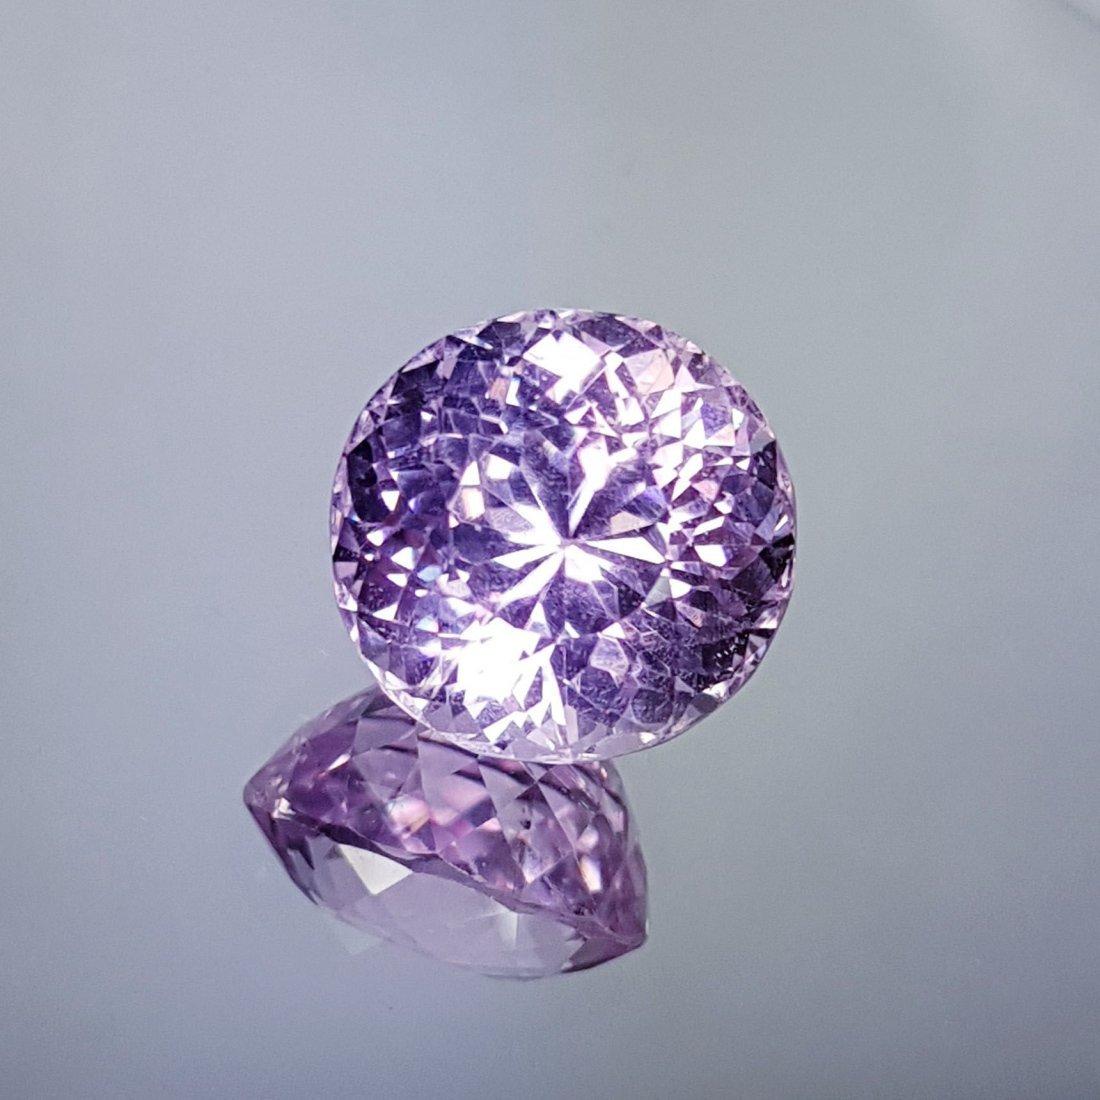 Pink Kunzite - 13.39 ct - 2